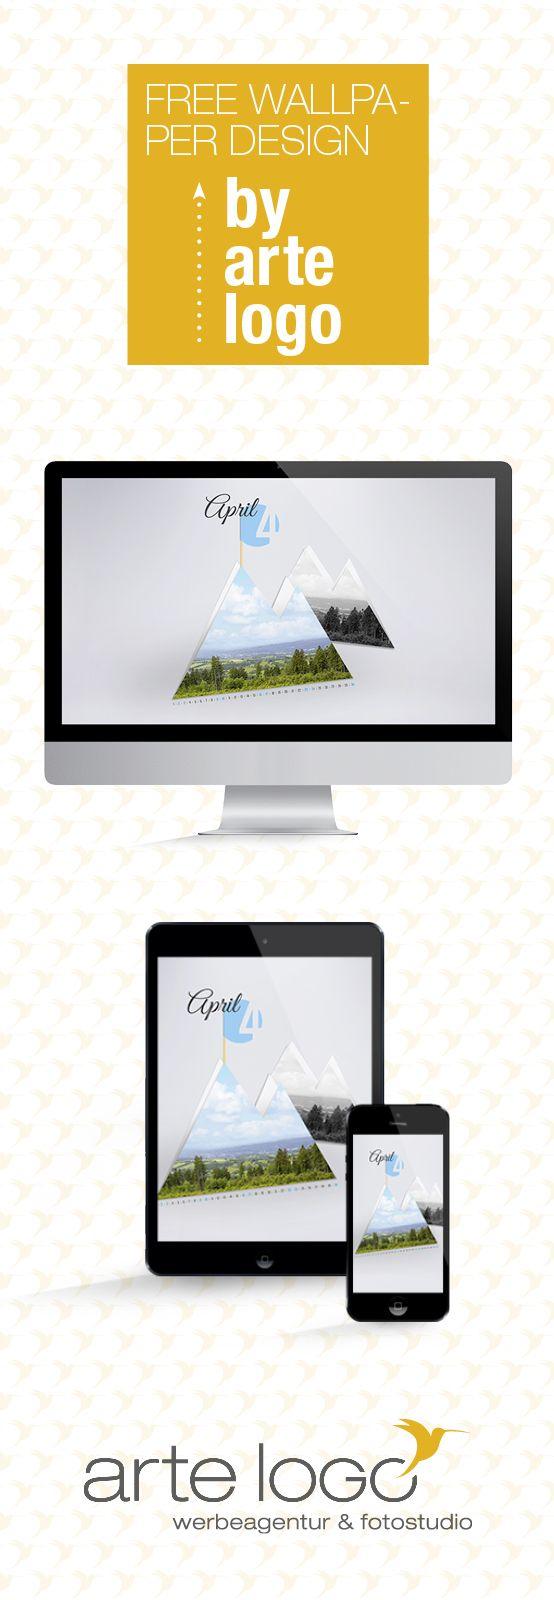 Free Wallpaper for Desktop,